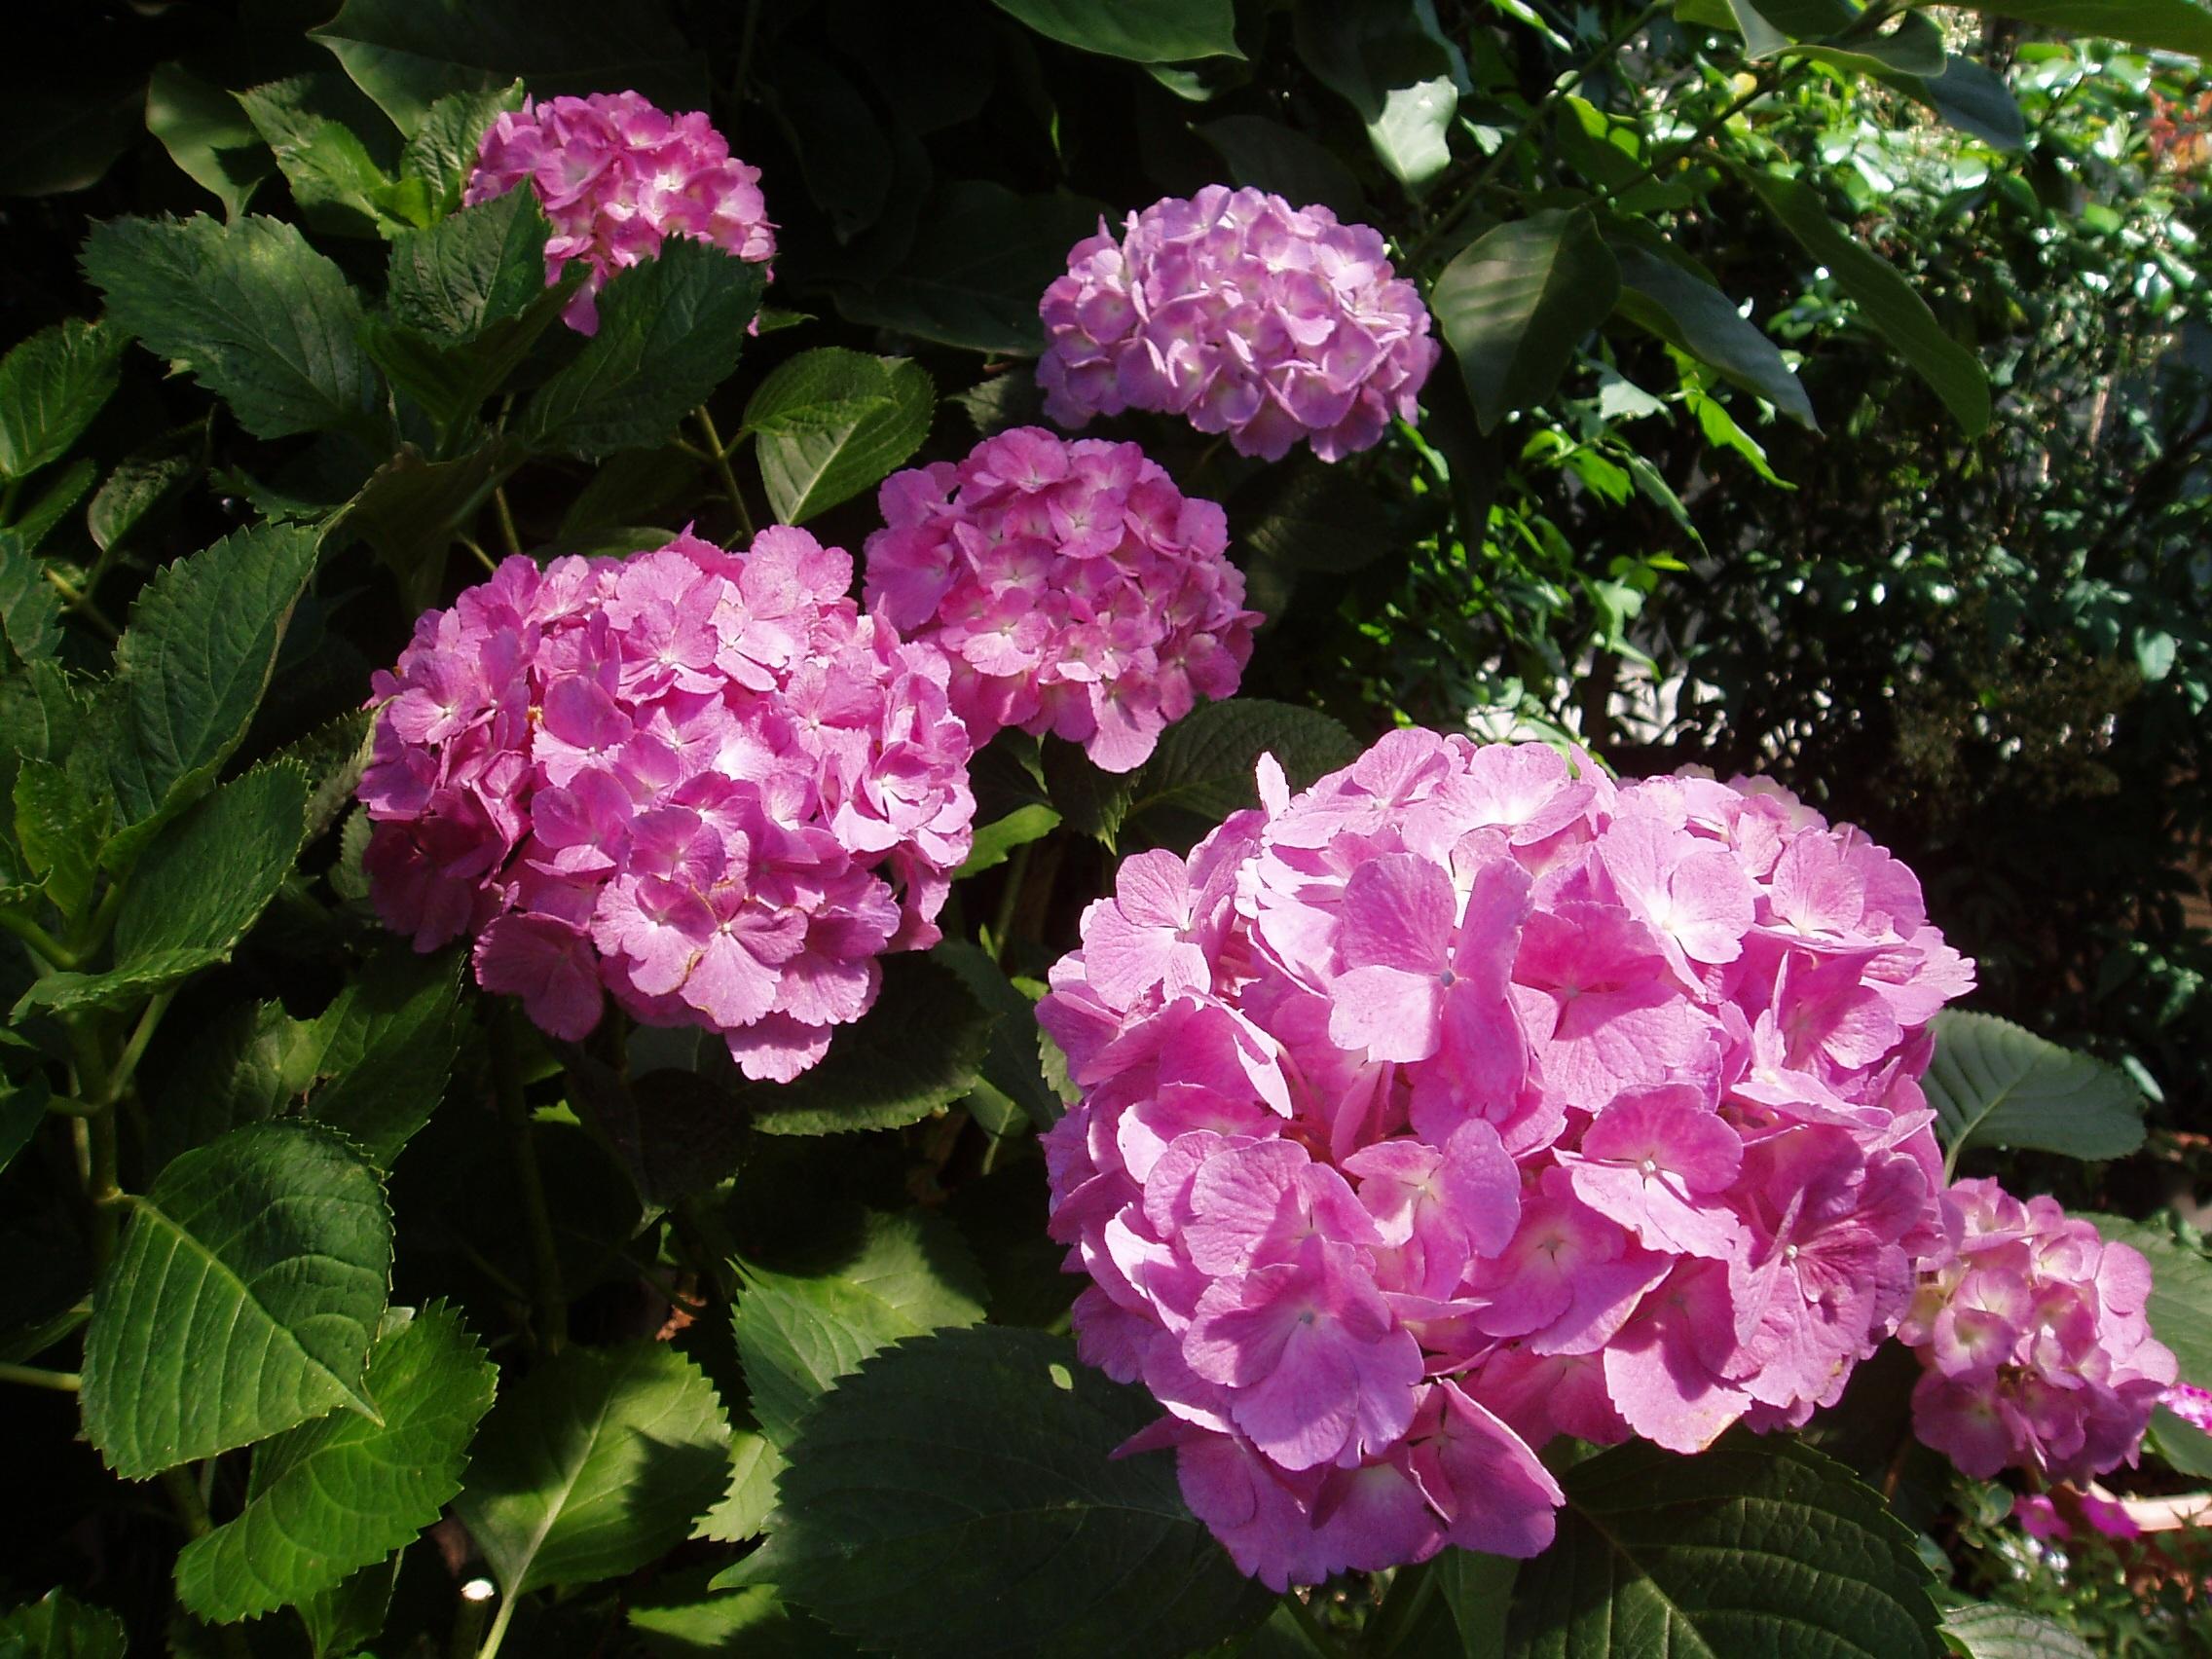 Free Images : Purple, Petal, Natural, Botany, Pink, Flora